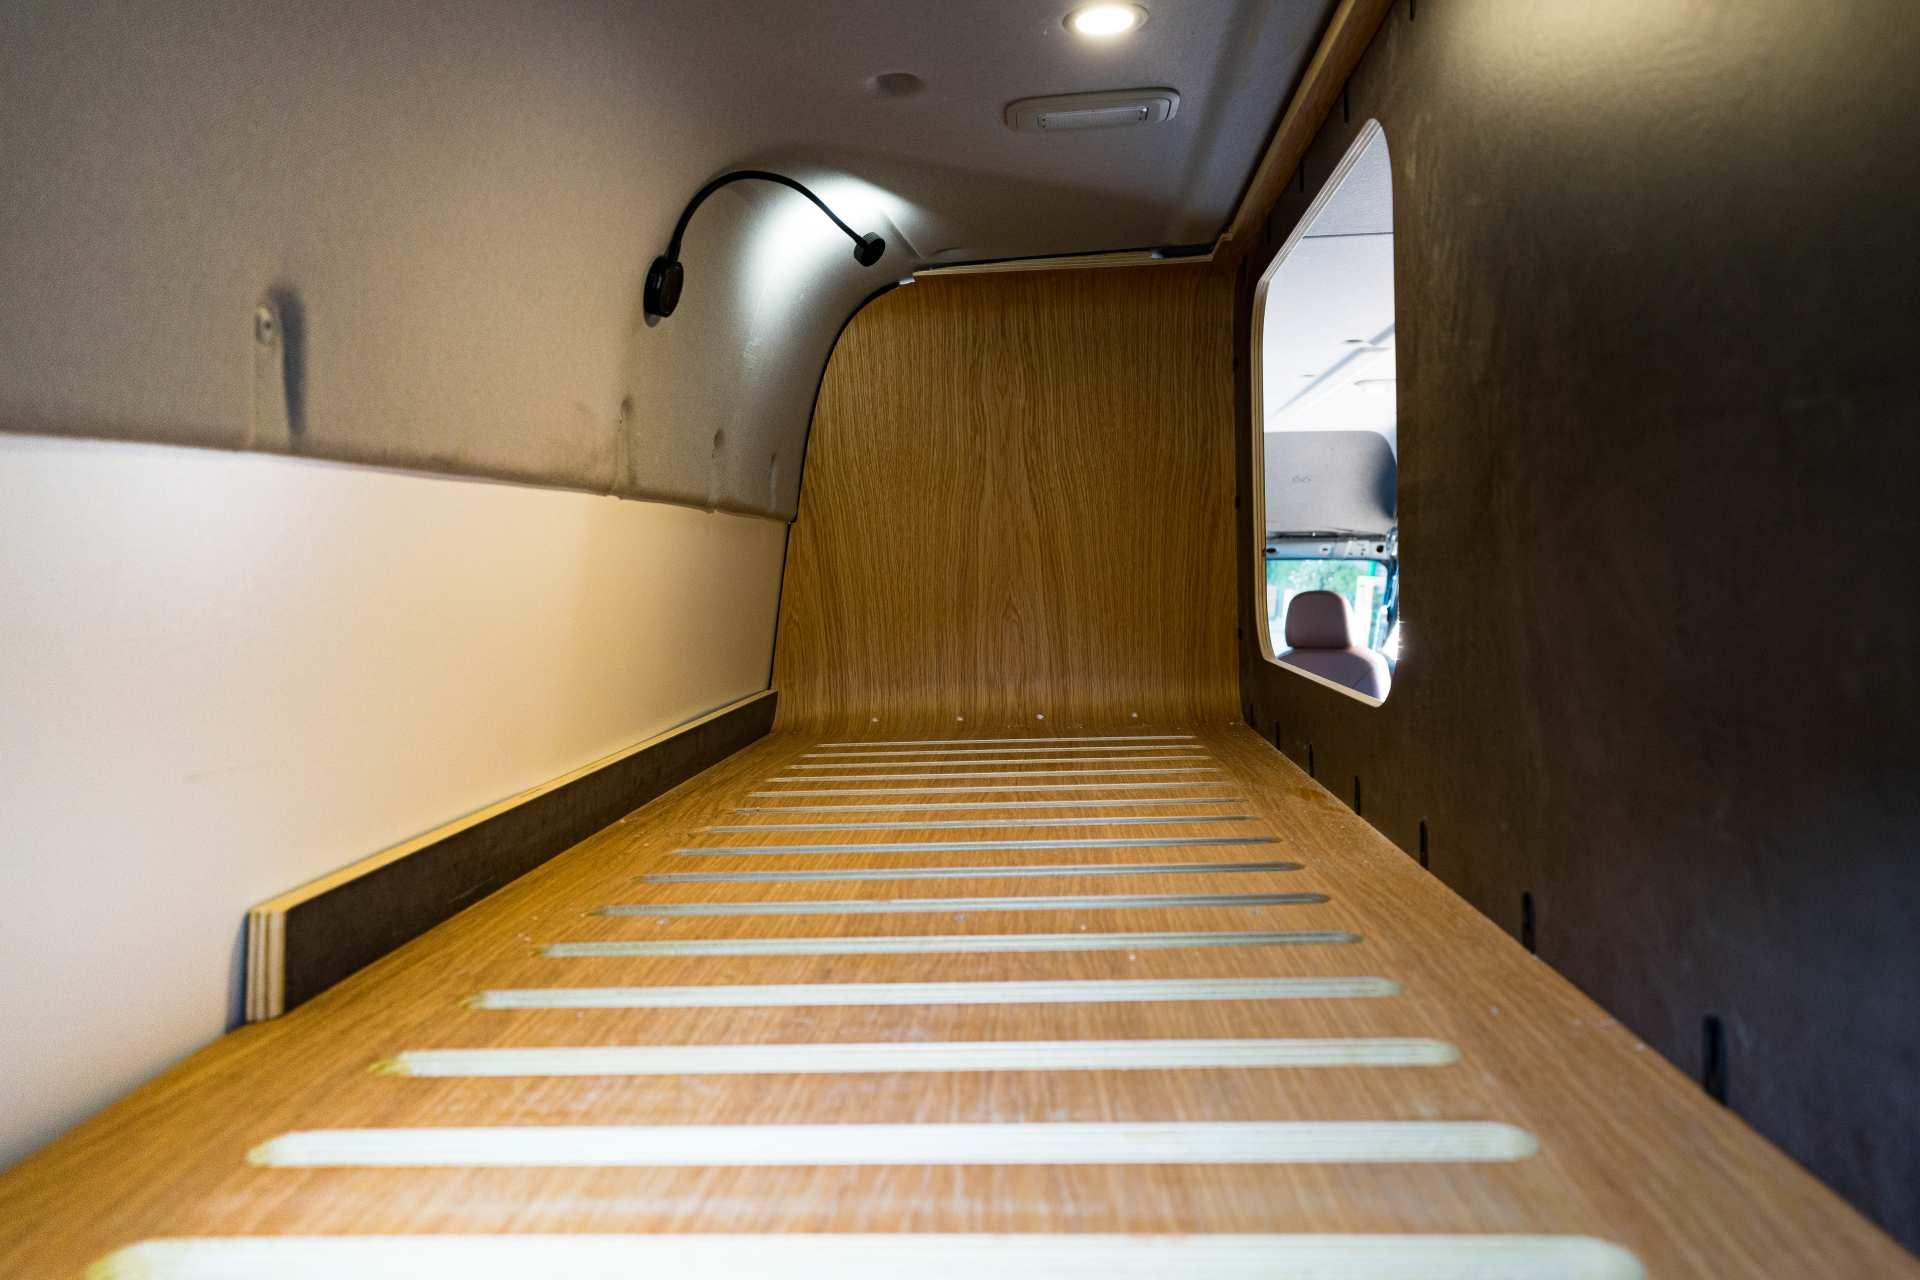 Individualausbau: Full House VW Crafter - 18